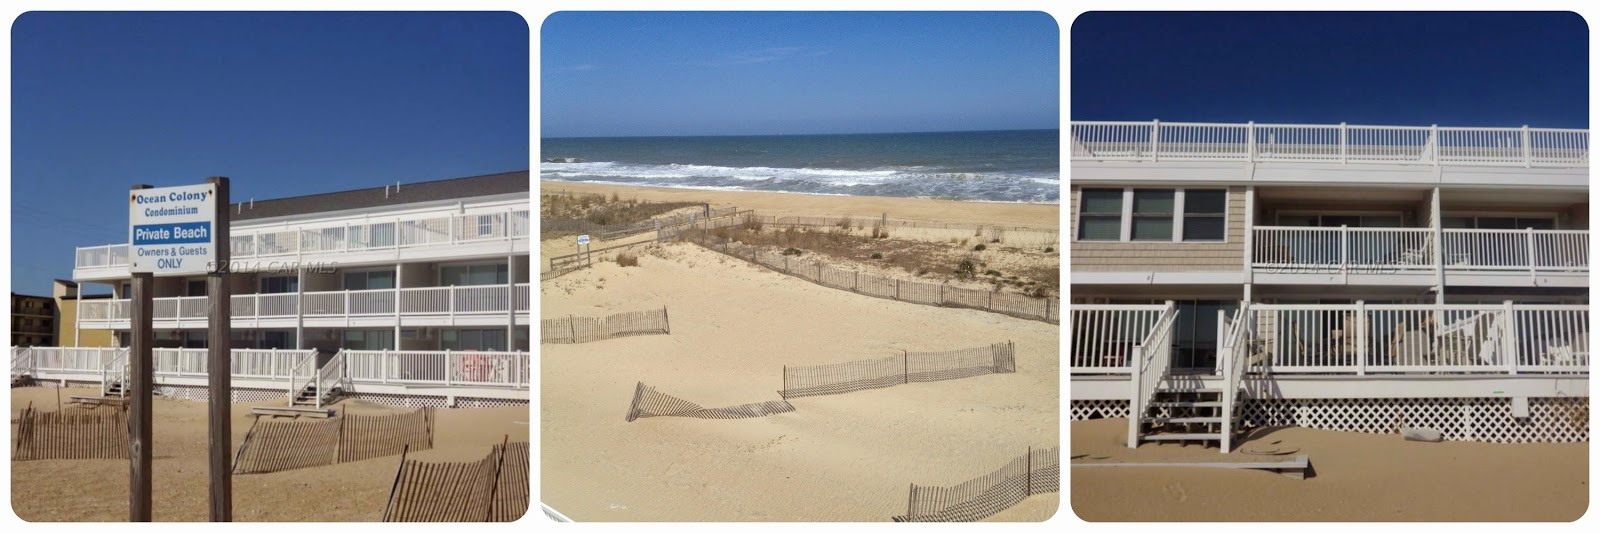 Your own private beach at Ocean Colony 7 www.condoinoceancitymaryland.com